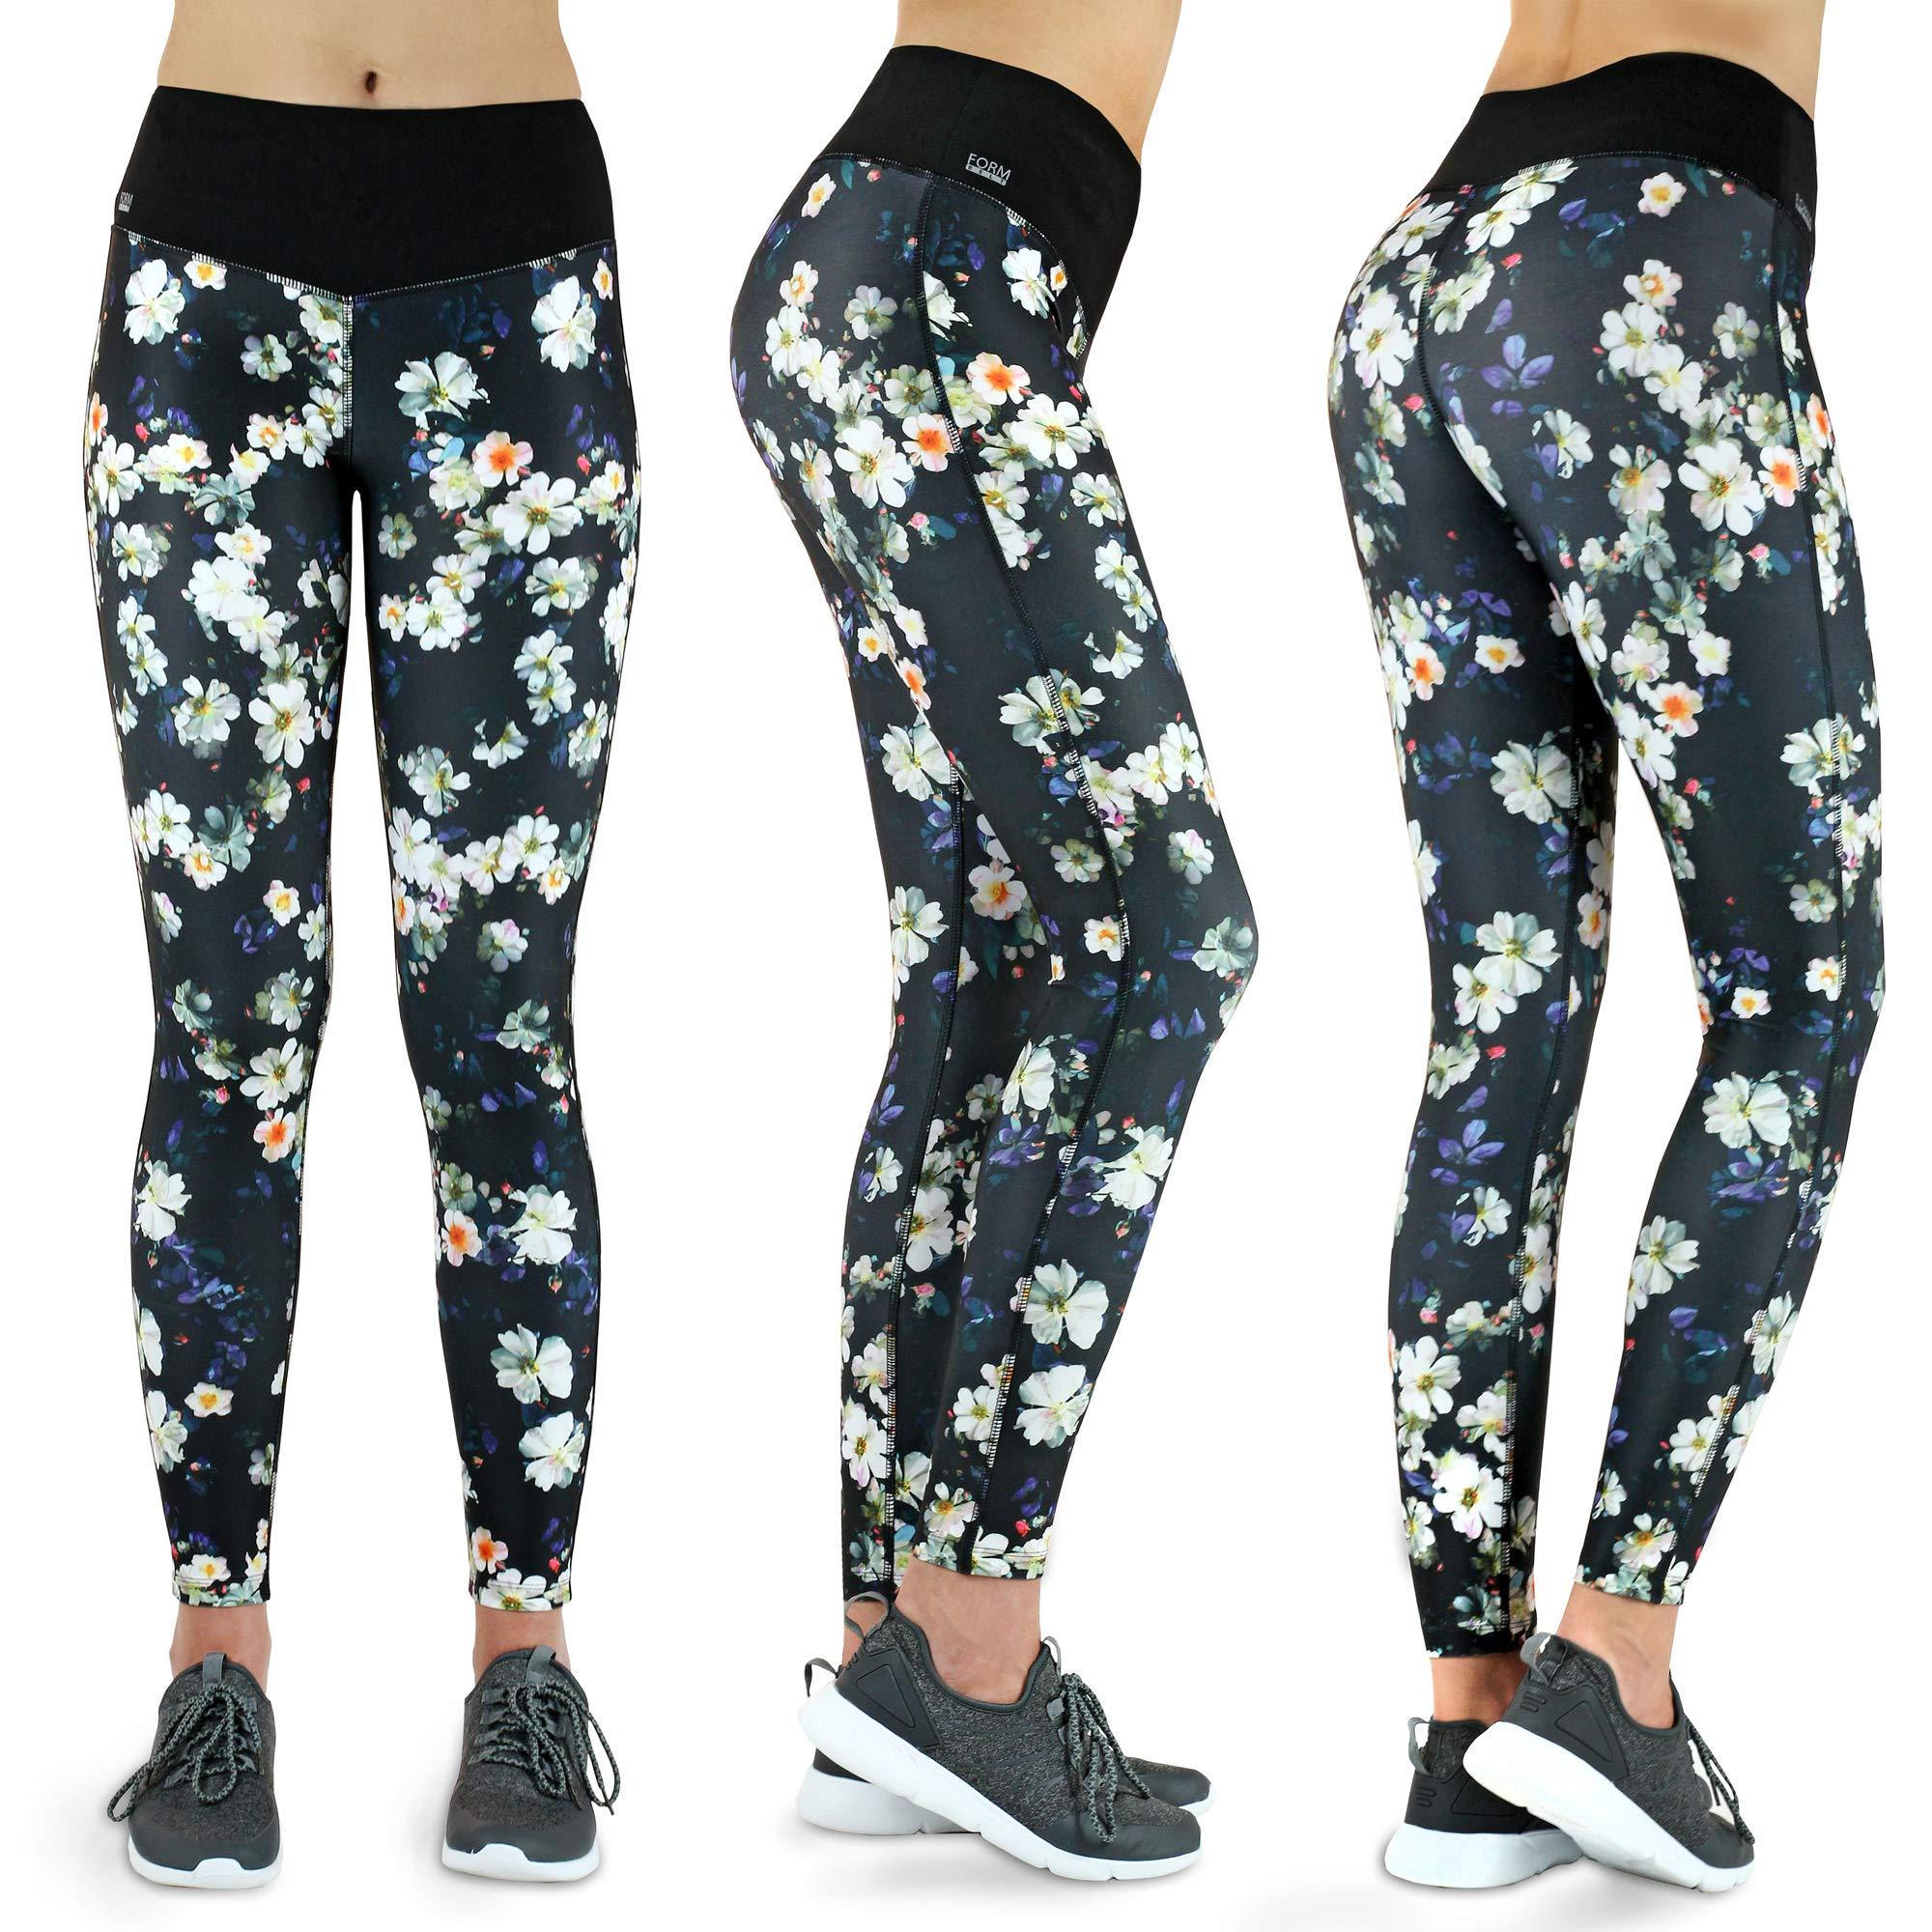 Formbelt® Pantalon Running Femme avec Ceinture Running Running-Belt -  Pantalon de Course 108ea524e4c